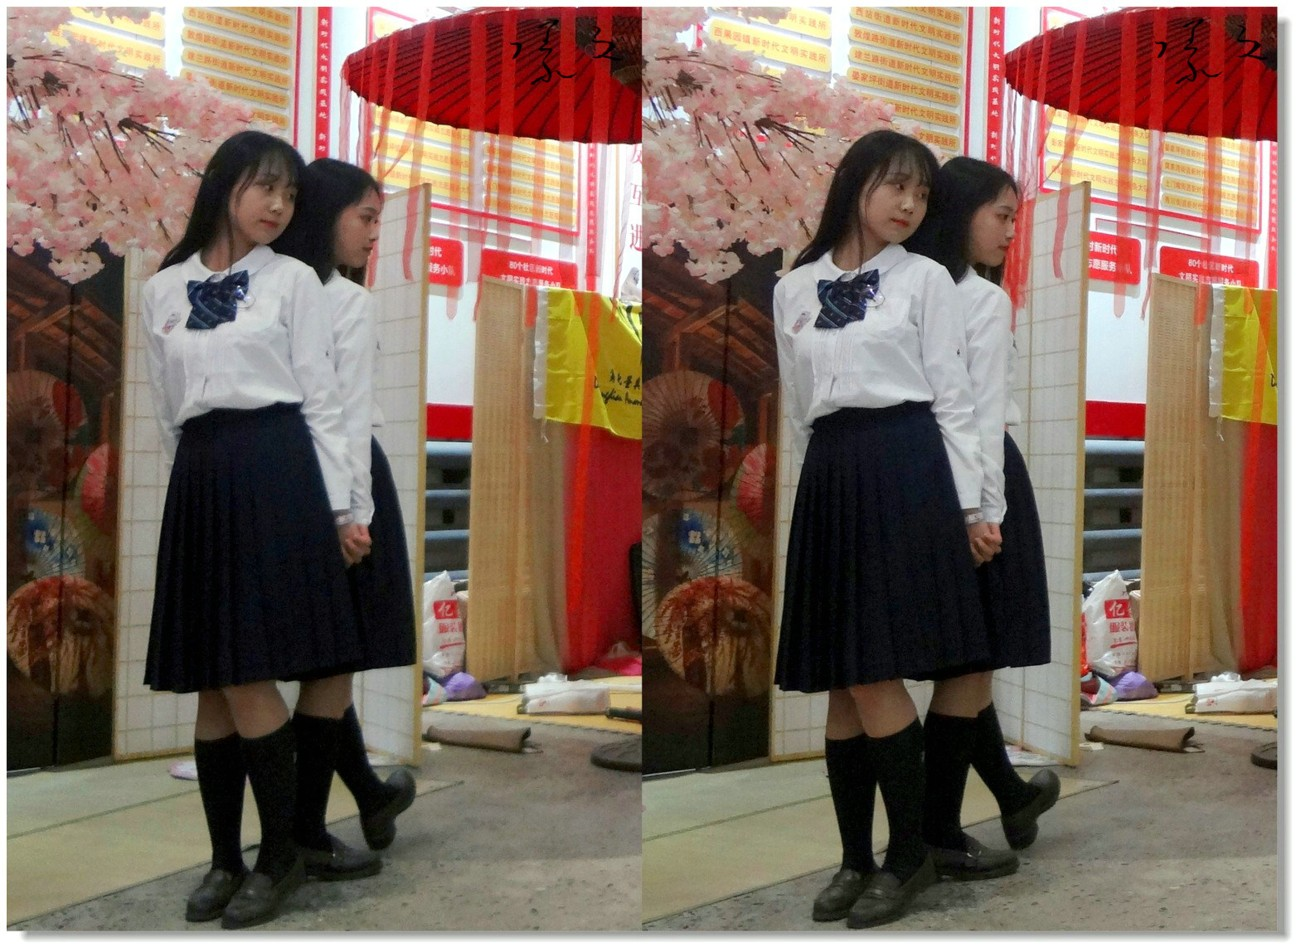 【原创】青春无敌美少女 -3